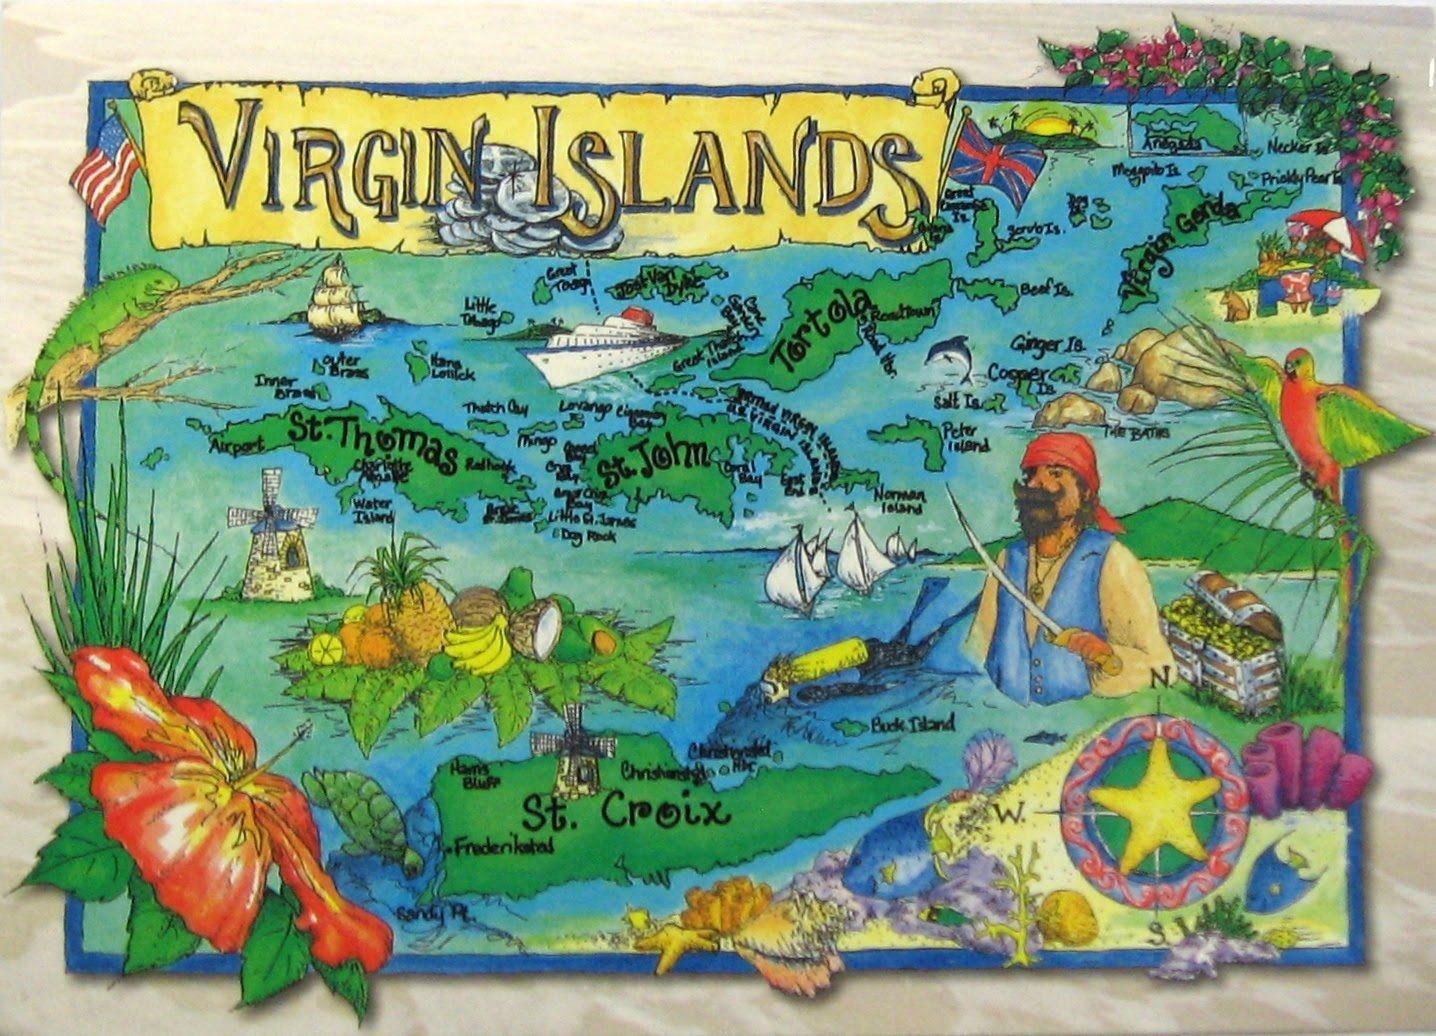 Virgin Islands Gift Baskets